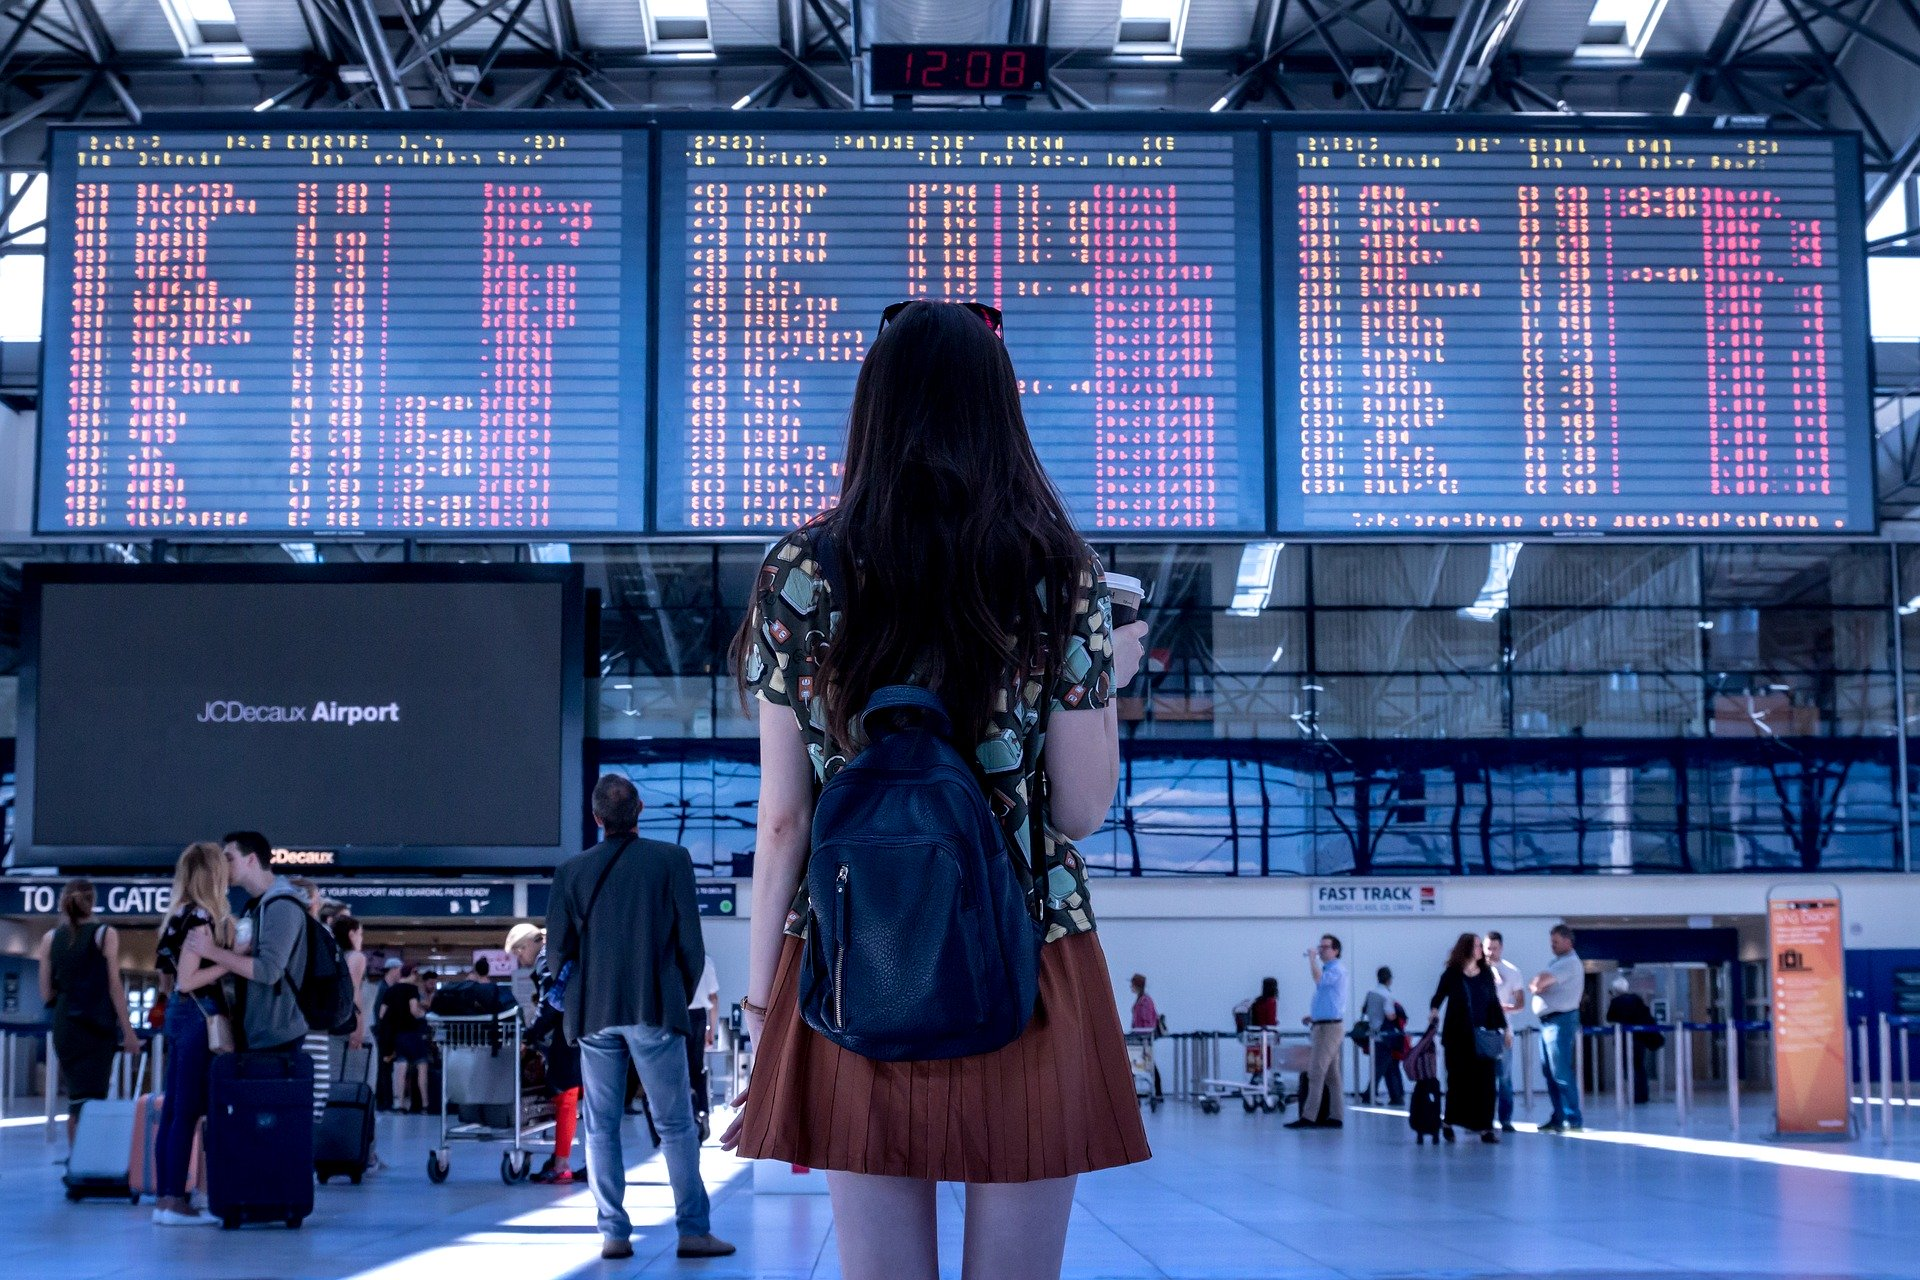 UK Travelers Increasingly Look